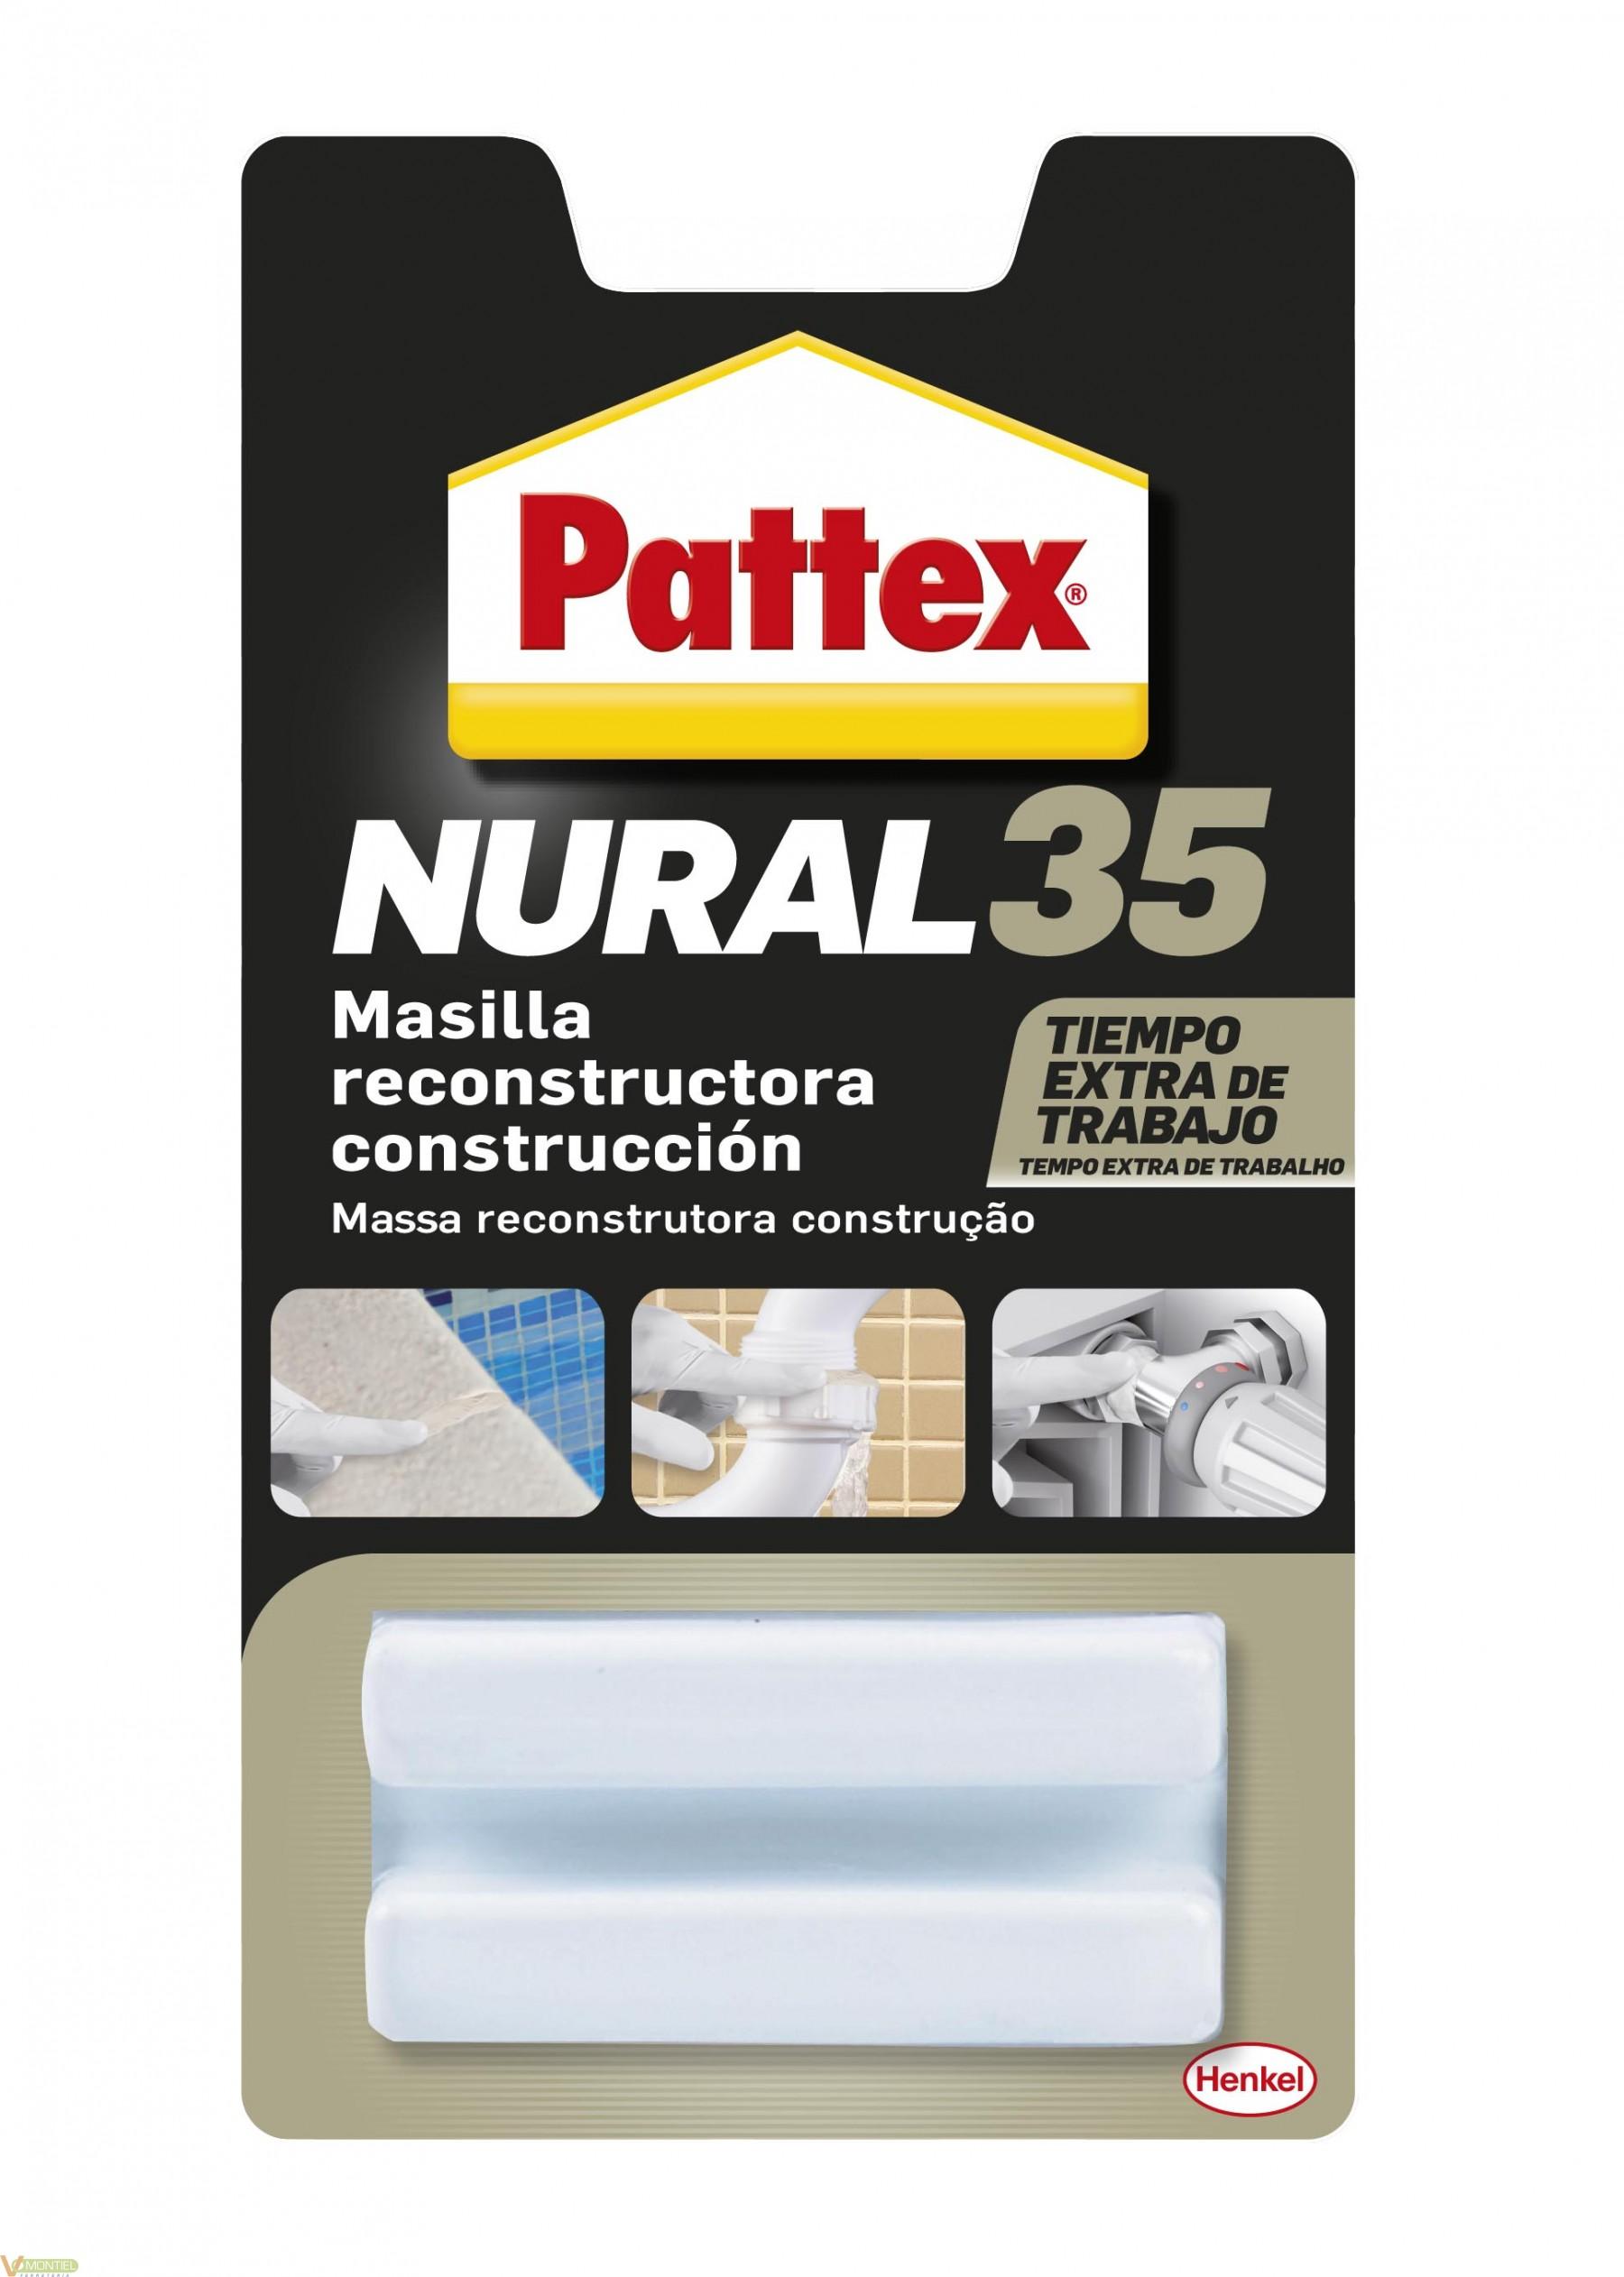 Masilla rest. const. gr pattex-0